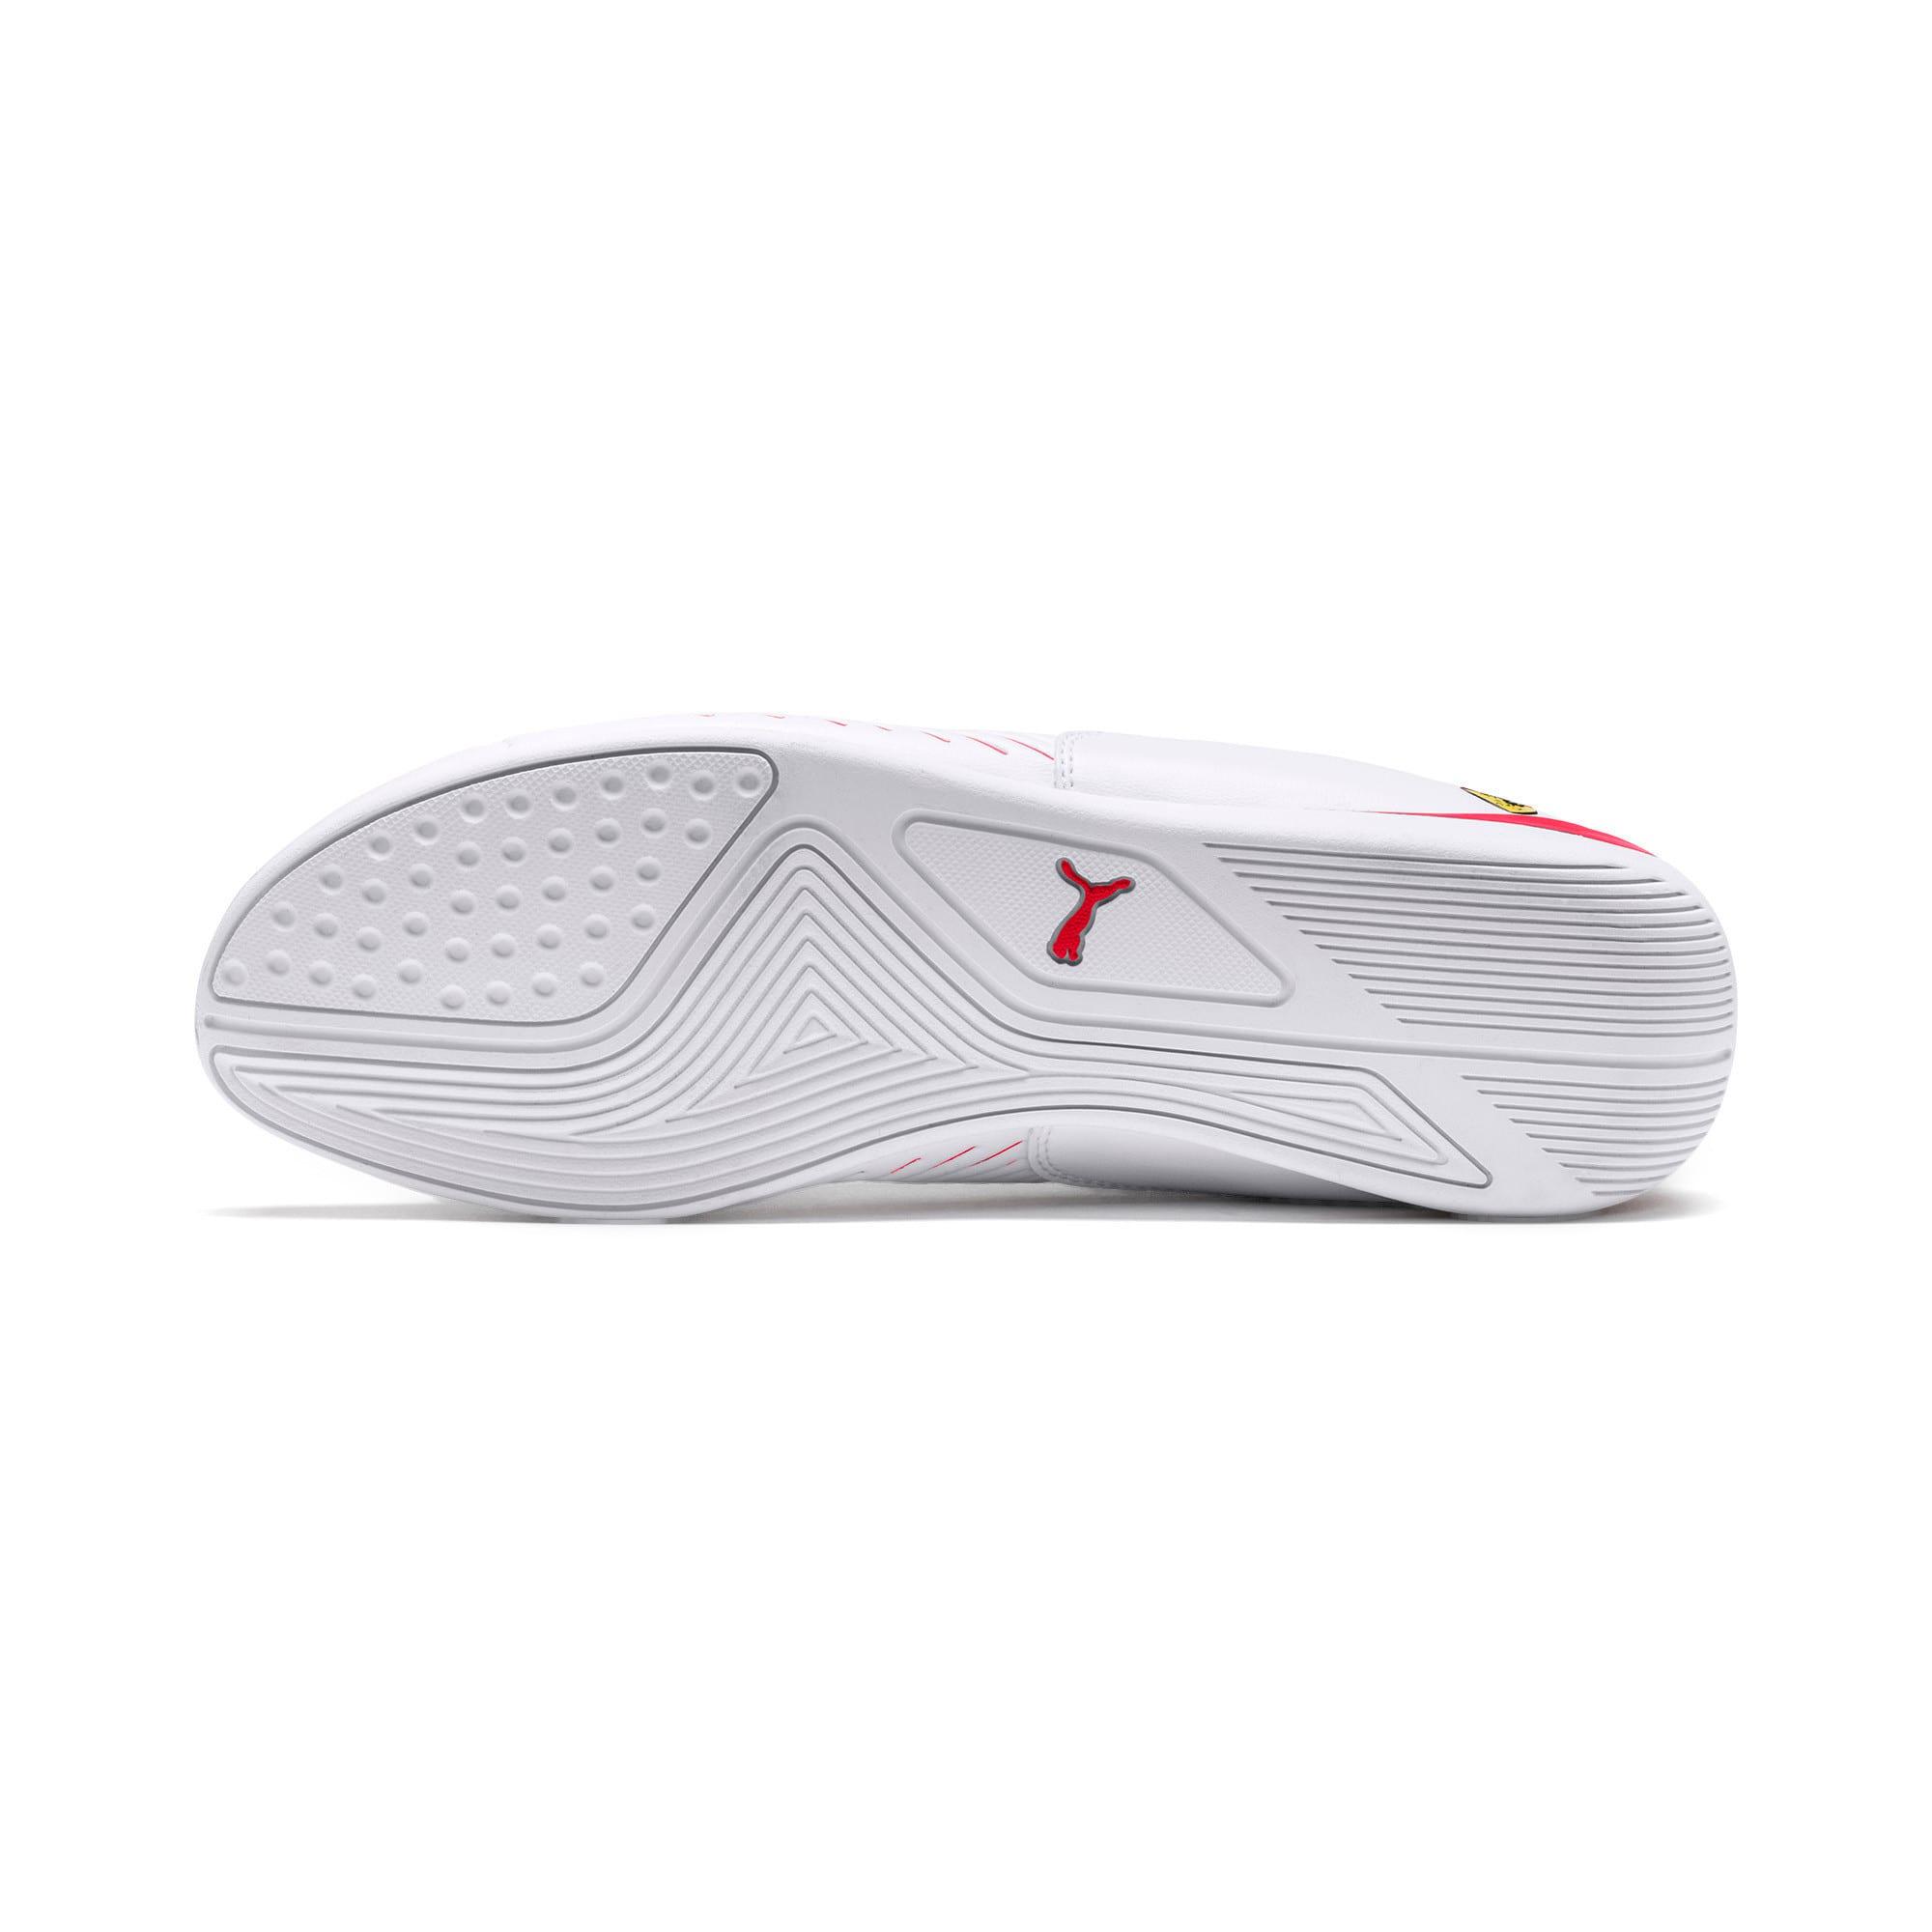 Thumbnail 7 of Ferrari Drift Cat 7S Ultra Men's Trainers, Puma White-Rosso Corsa, medium-IND